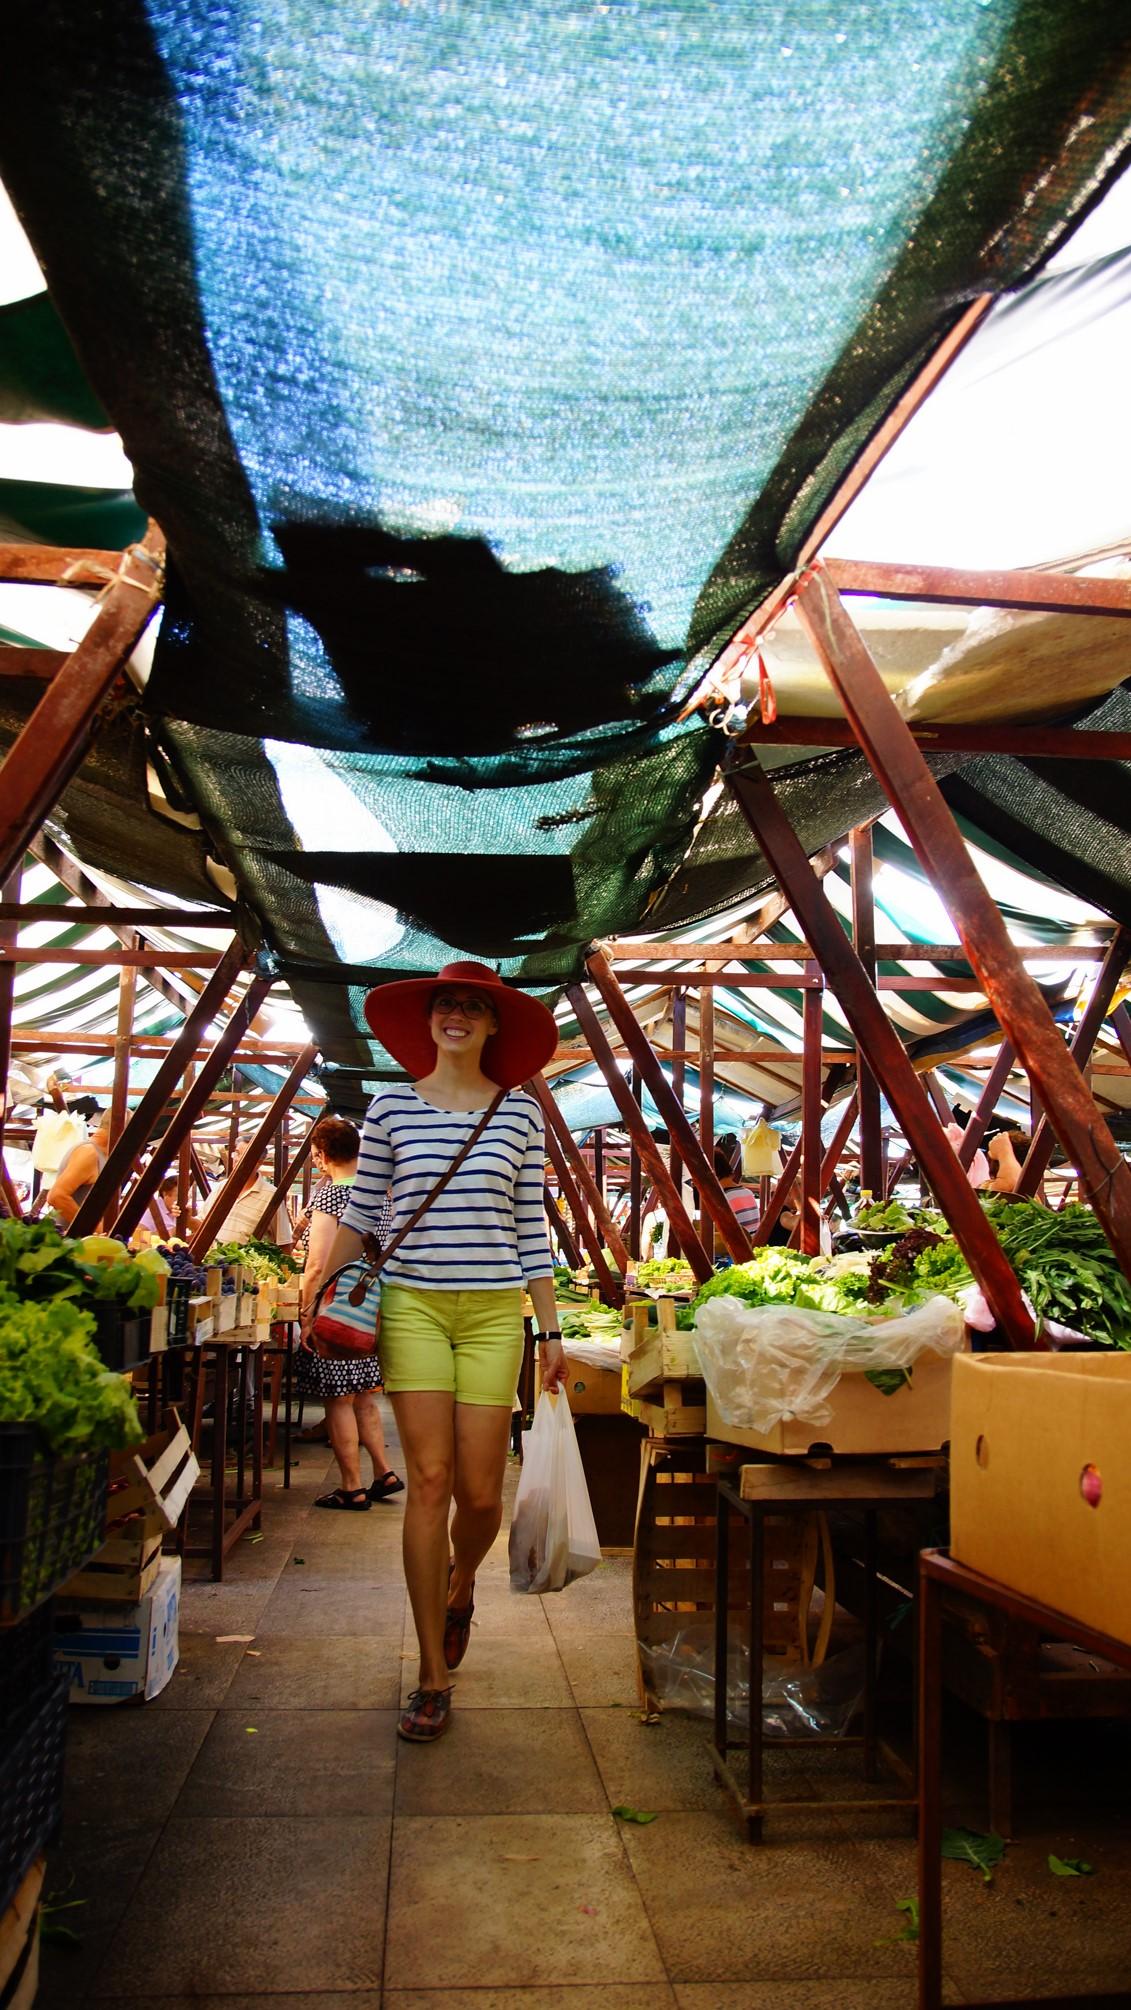 Food market, Zadar